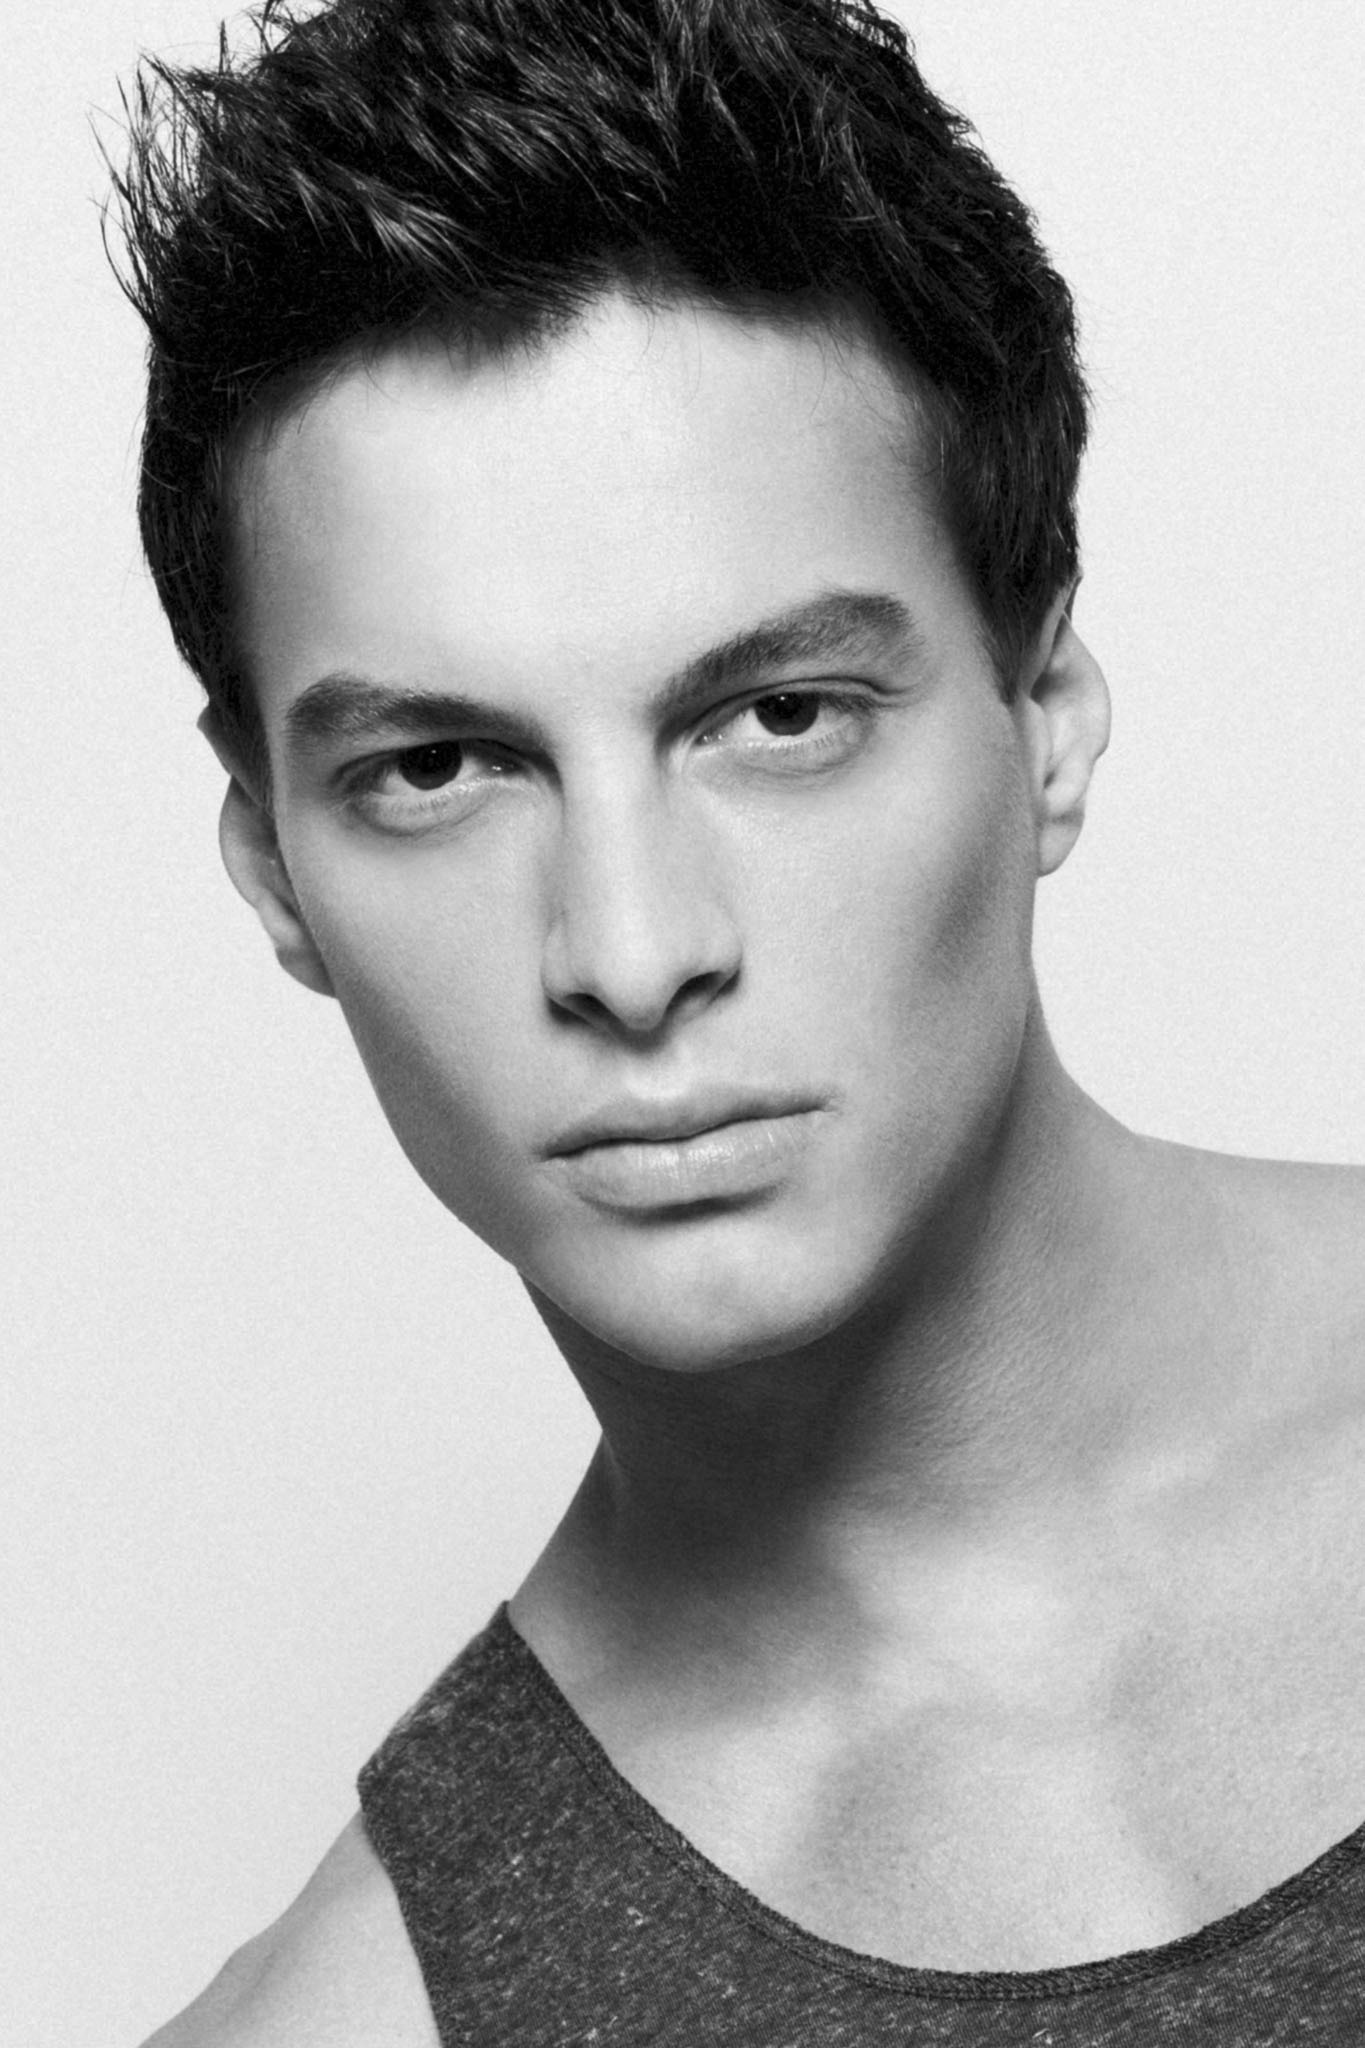 nyc-photographers-male-model-test-10028.jpg